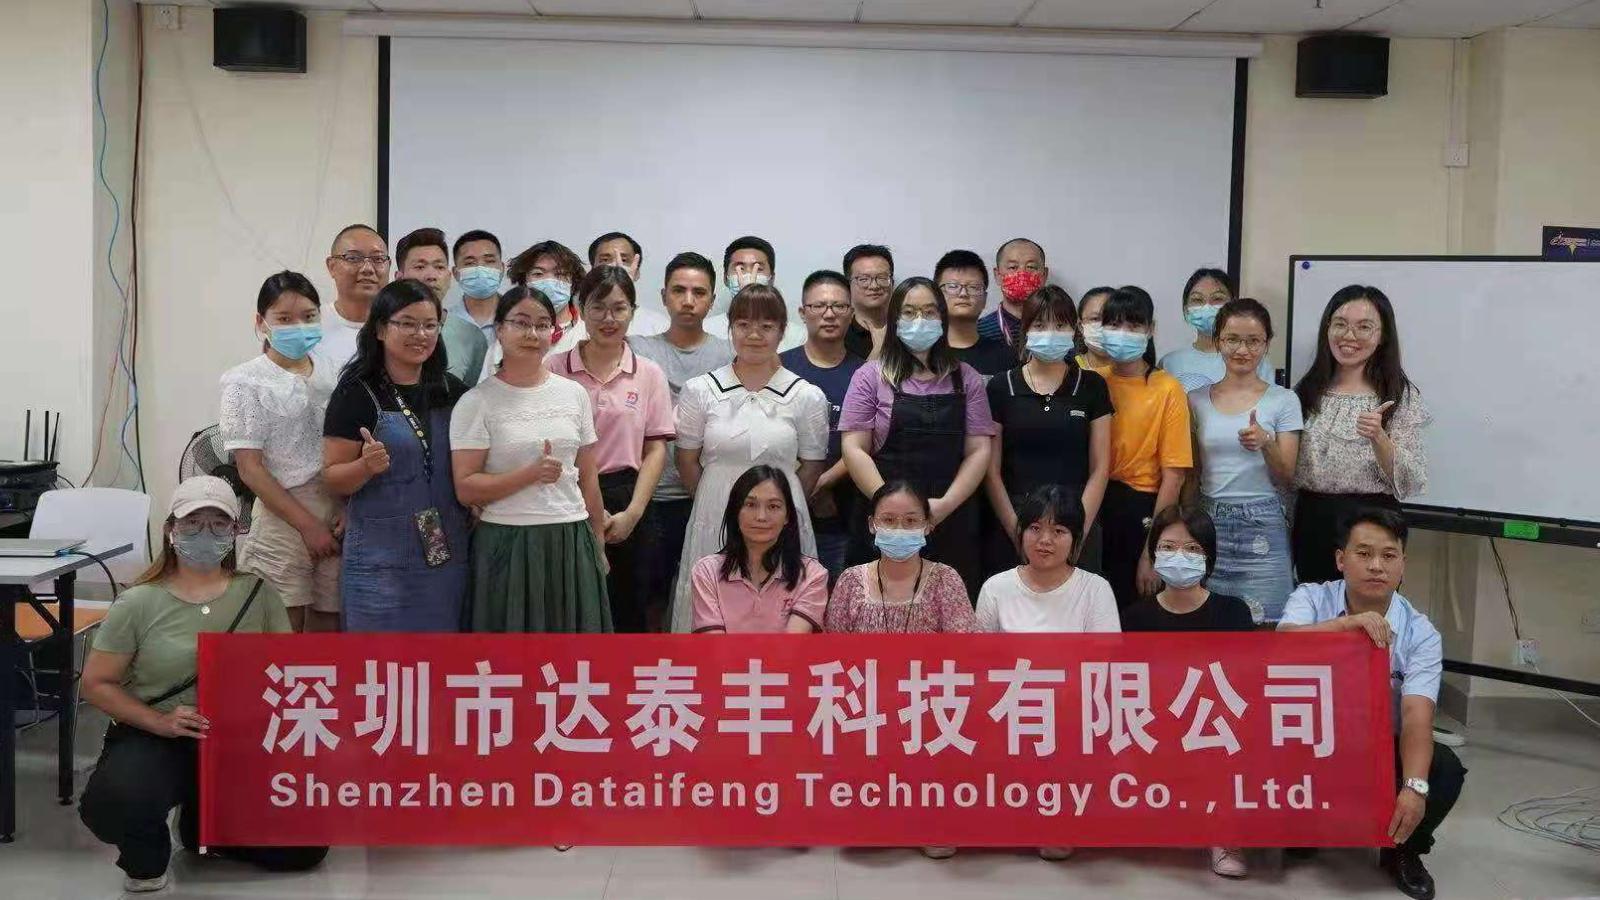 Shenzhen DataFeng Technology Co., Ltd. participó en la foto de graduación de capacitación técnica.